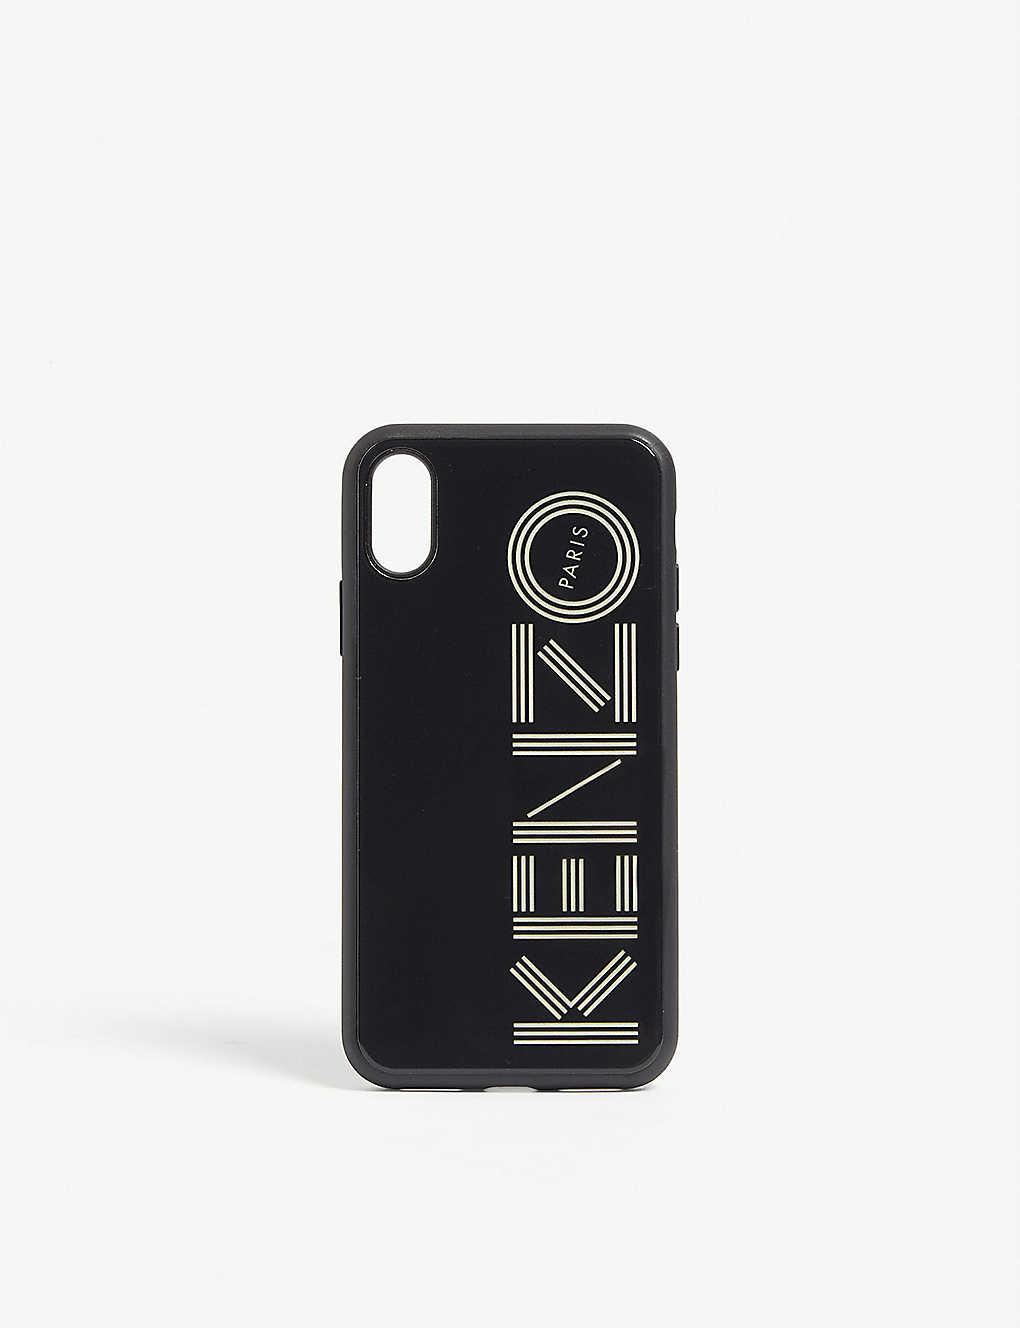 online retailer 0b2b3 b61f3 Logo tempered glass iphone X case